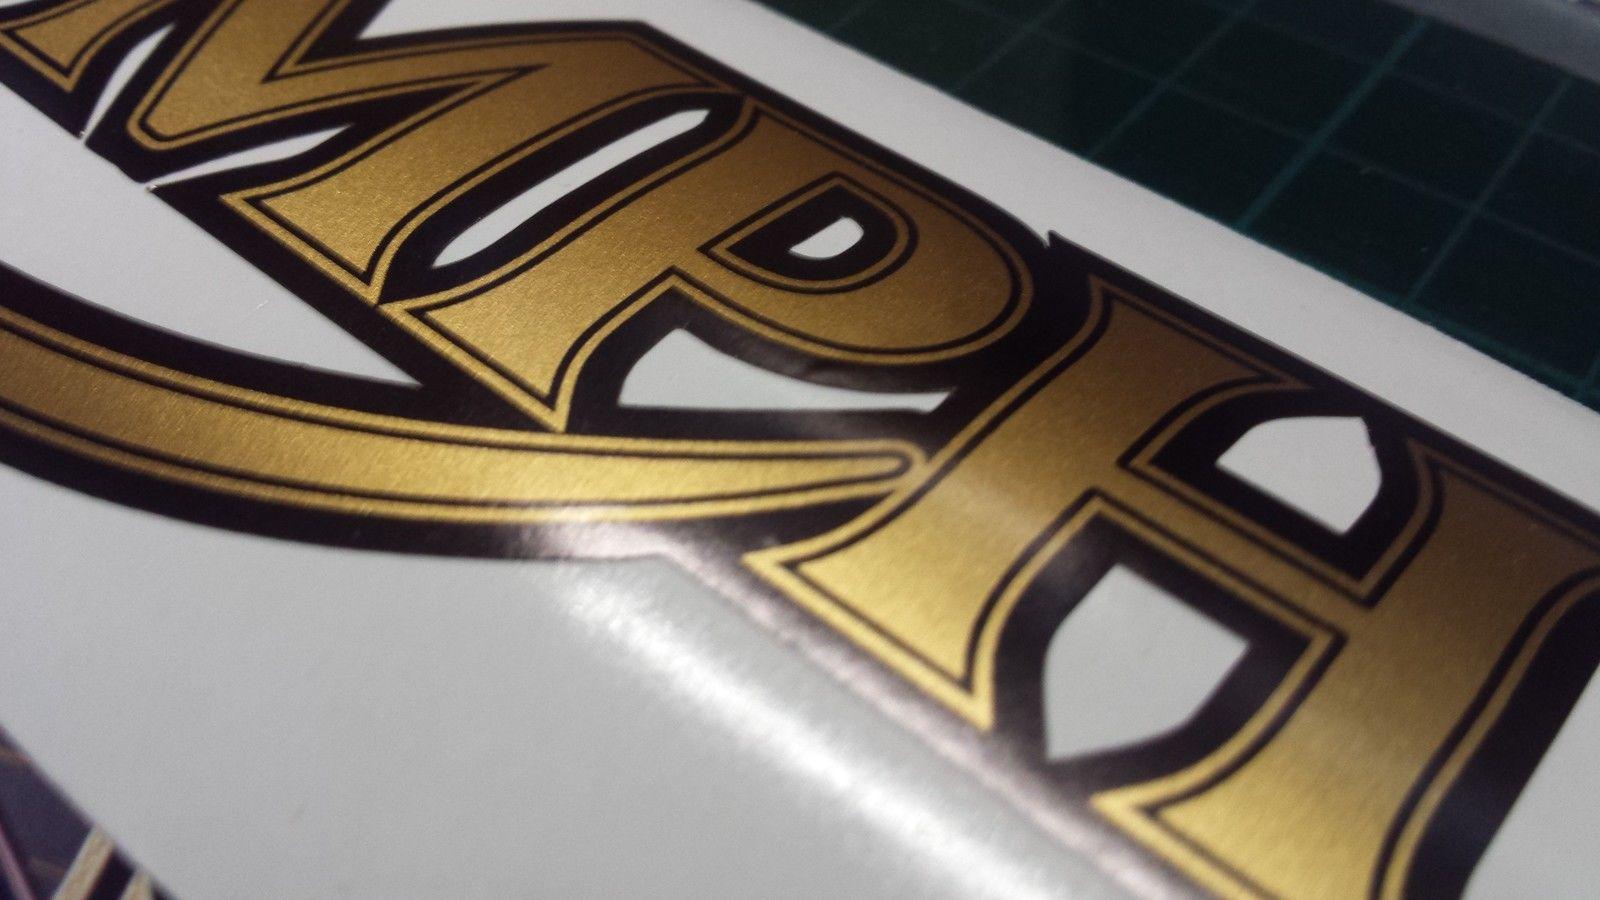 Triumph Tank Decal X2 Sticker Decal Graphics Restoration